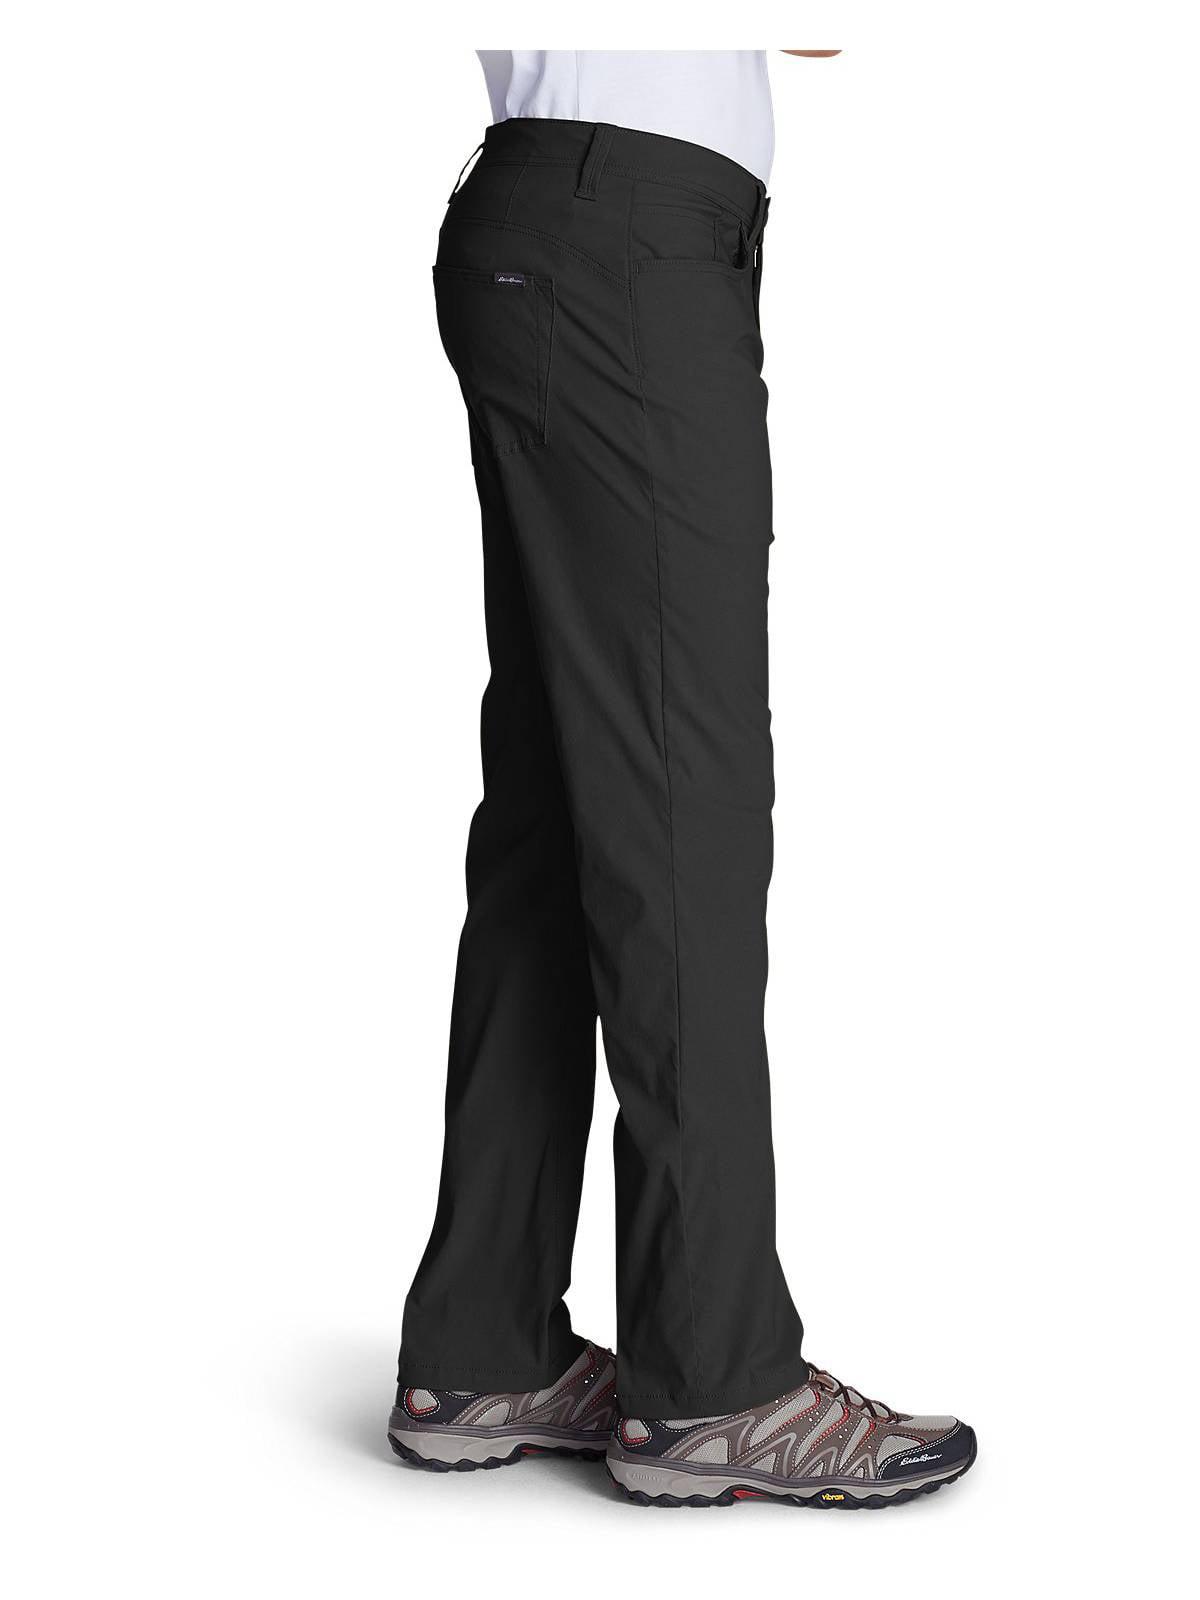 Straight Fit Eddie Bauer Mens Horizon Guide Five-Pocket Pants